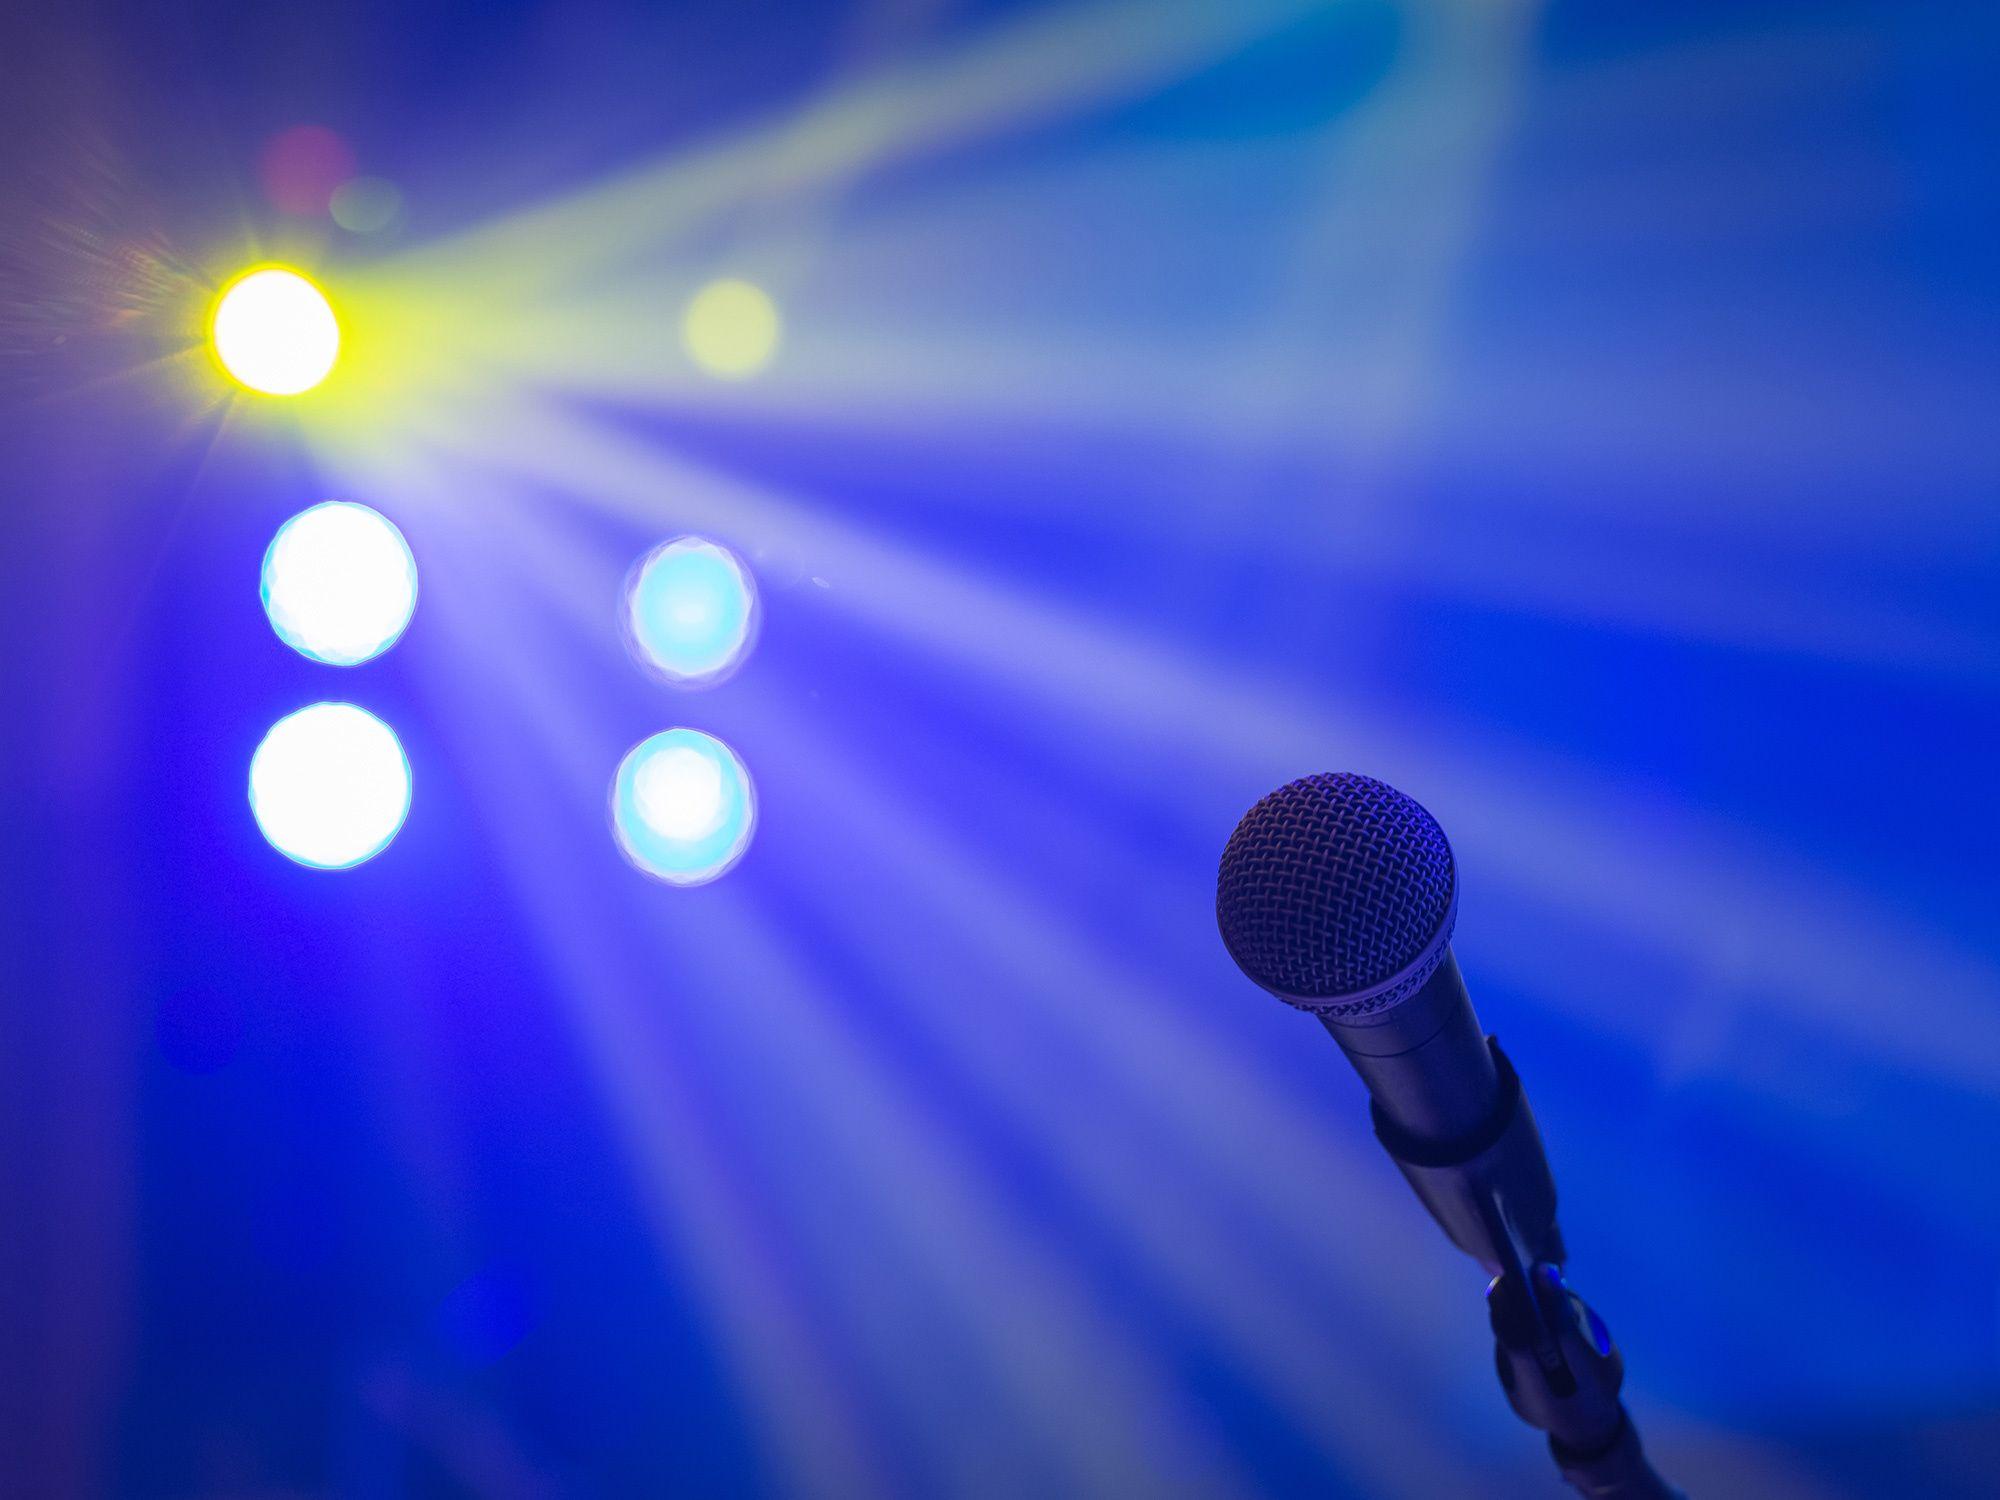 Karaoke microphone and stage lights.